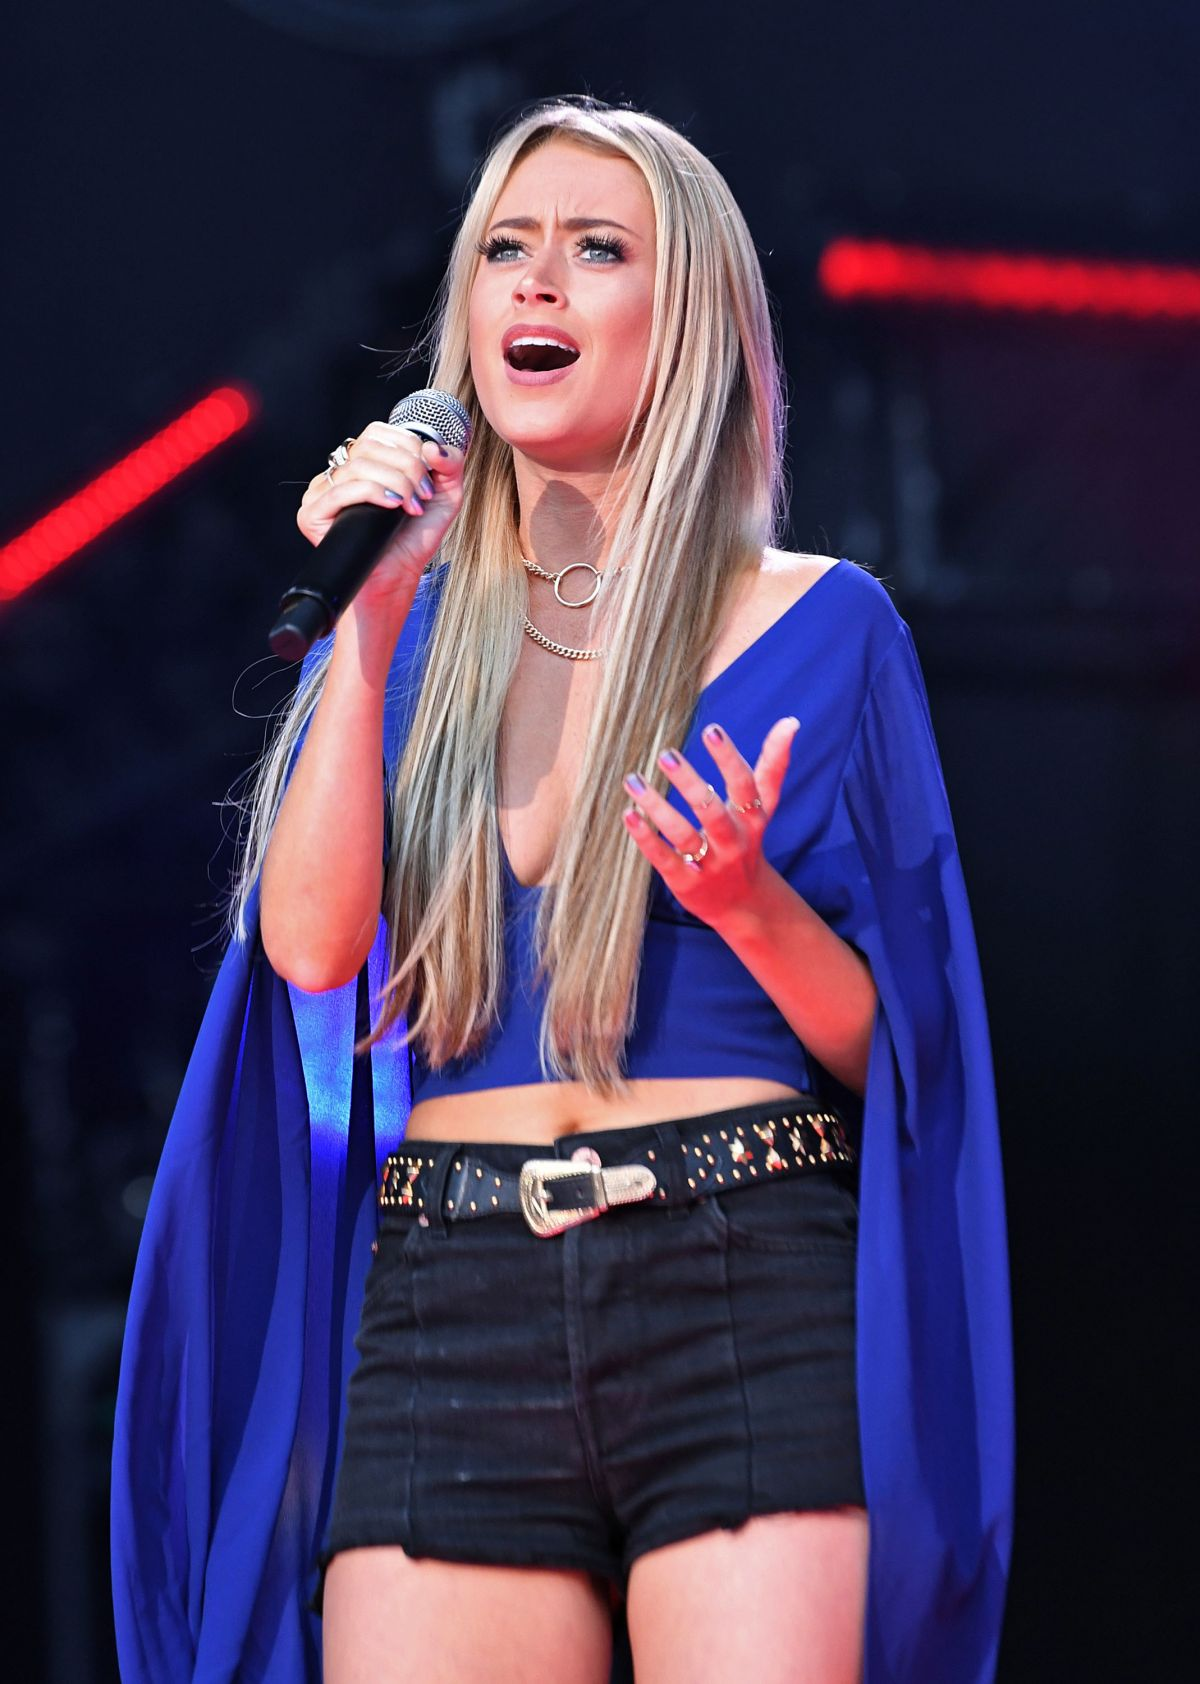 BROOKE EDEN Performs at 2017 CMA Music Festival Nightly Concert in Nashville 06/09/2017